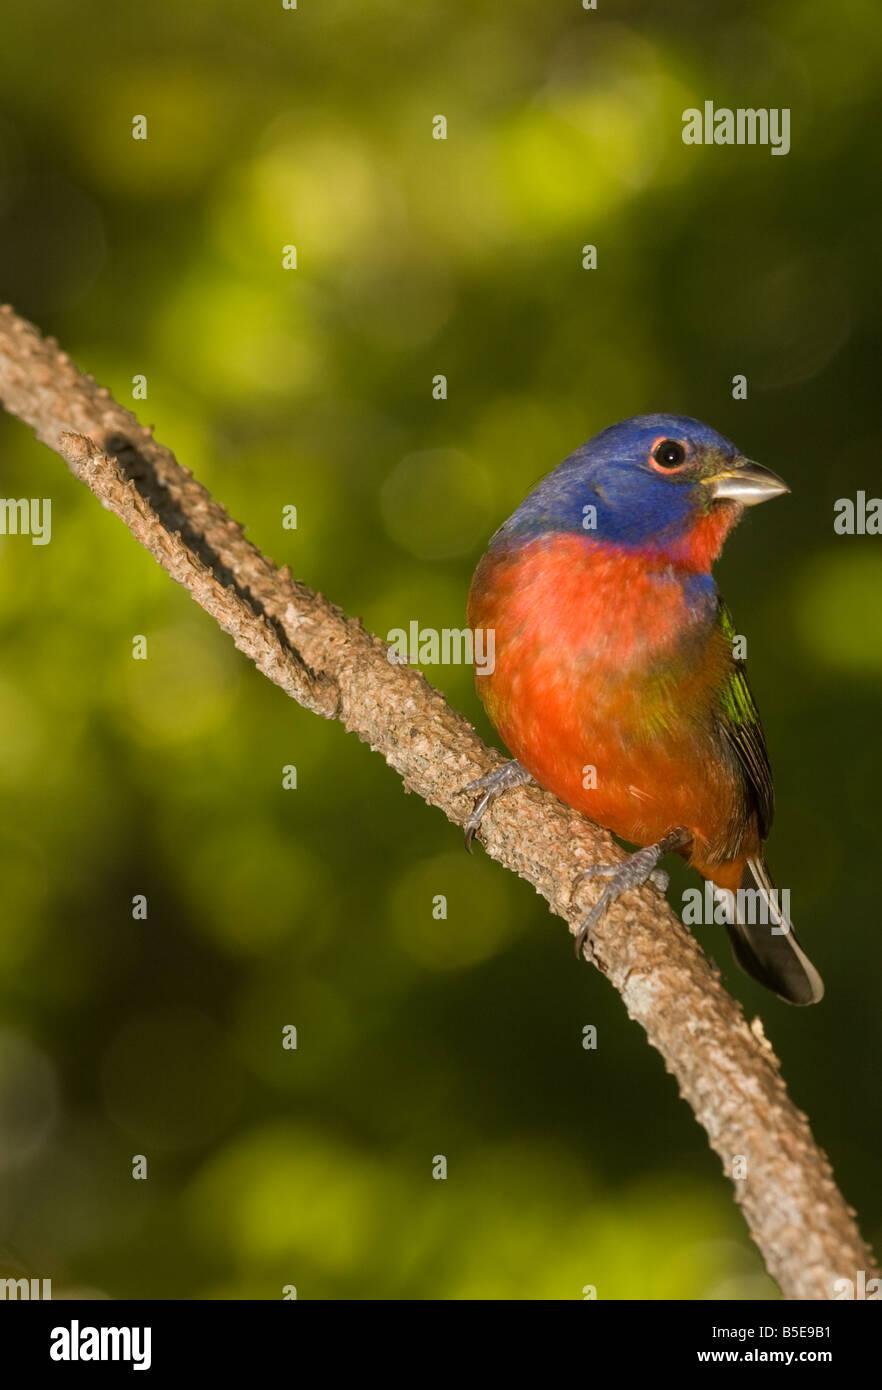 Male Painted Bunting passerina ciris - Stock Image